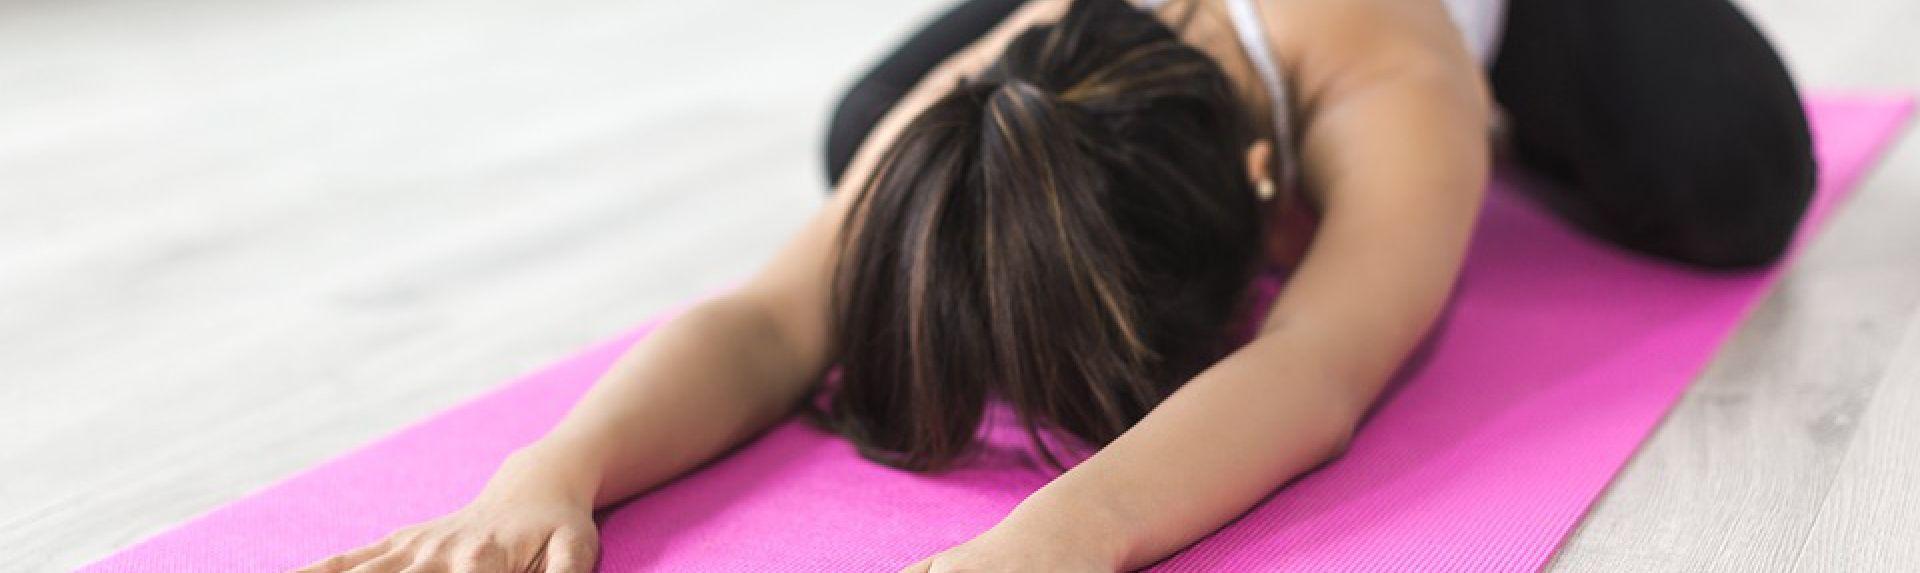 Контрацепция и спорт: могут ли контрацептивы влиять на эффект занятий физкультурой